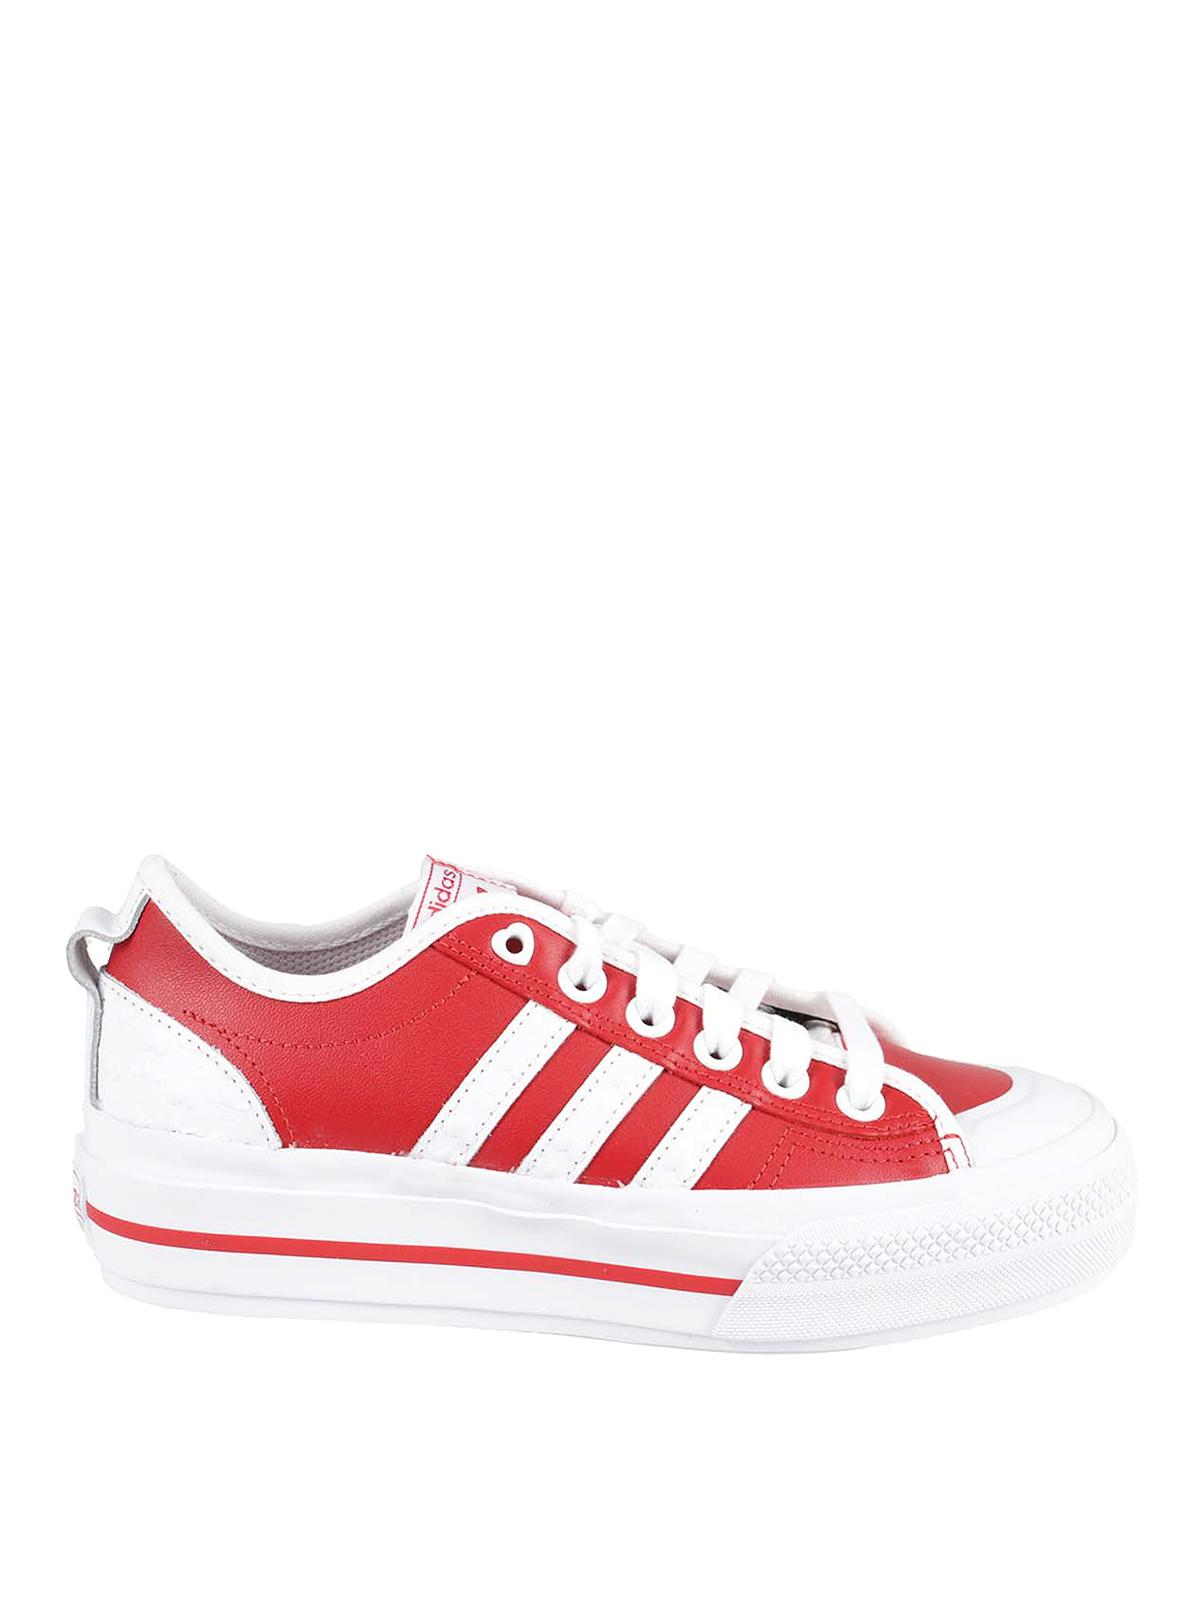 Adidas Originals Nizza Rf Platform Sneakers In Red